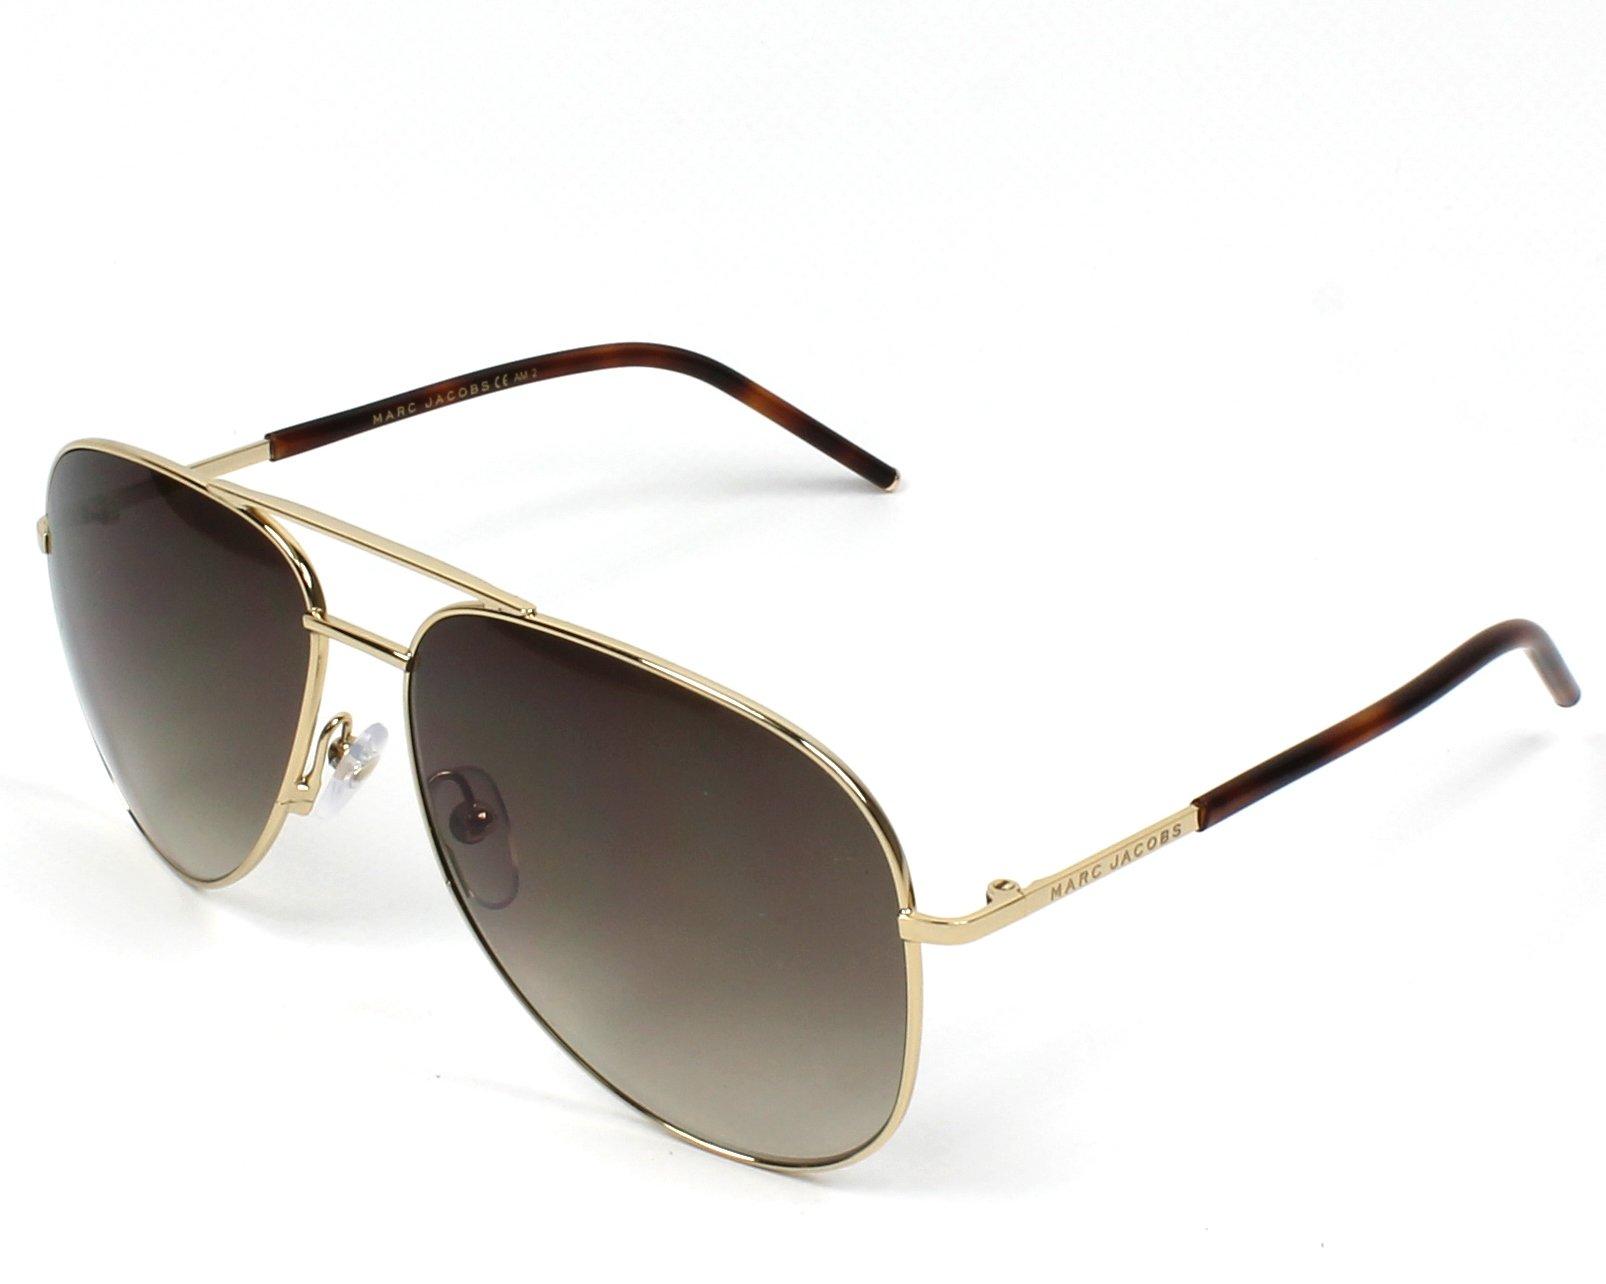 c3980723b76 Sunglasses Marc Jacobs MARC-60-S TAV CC 59-14 Gold Havana